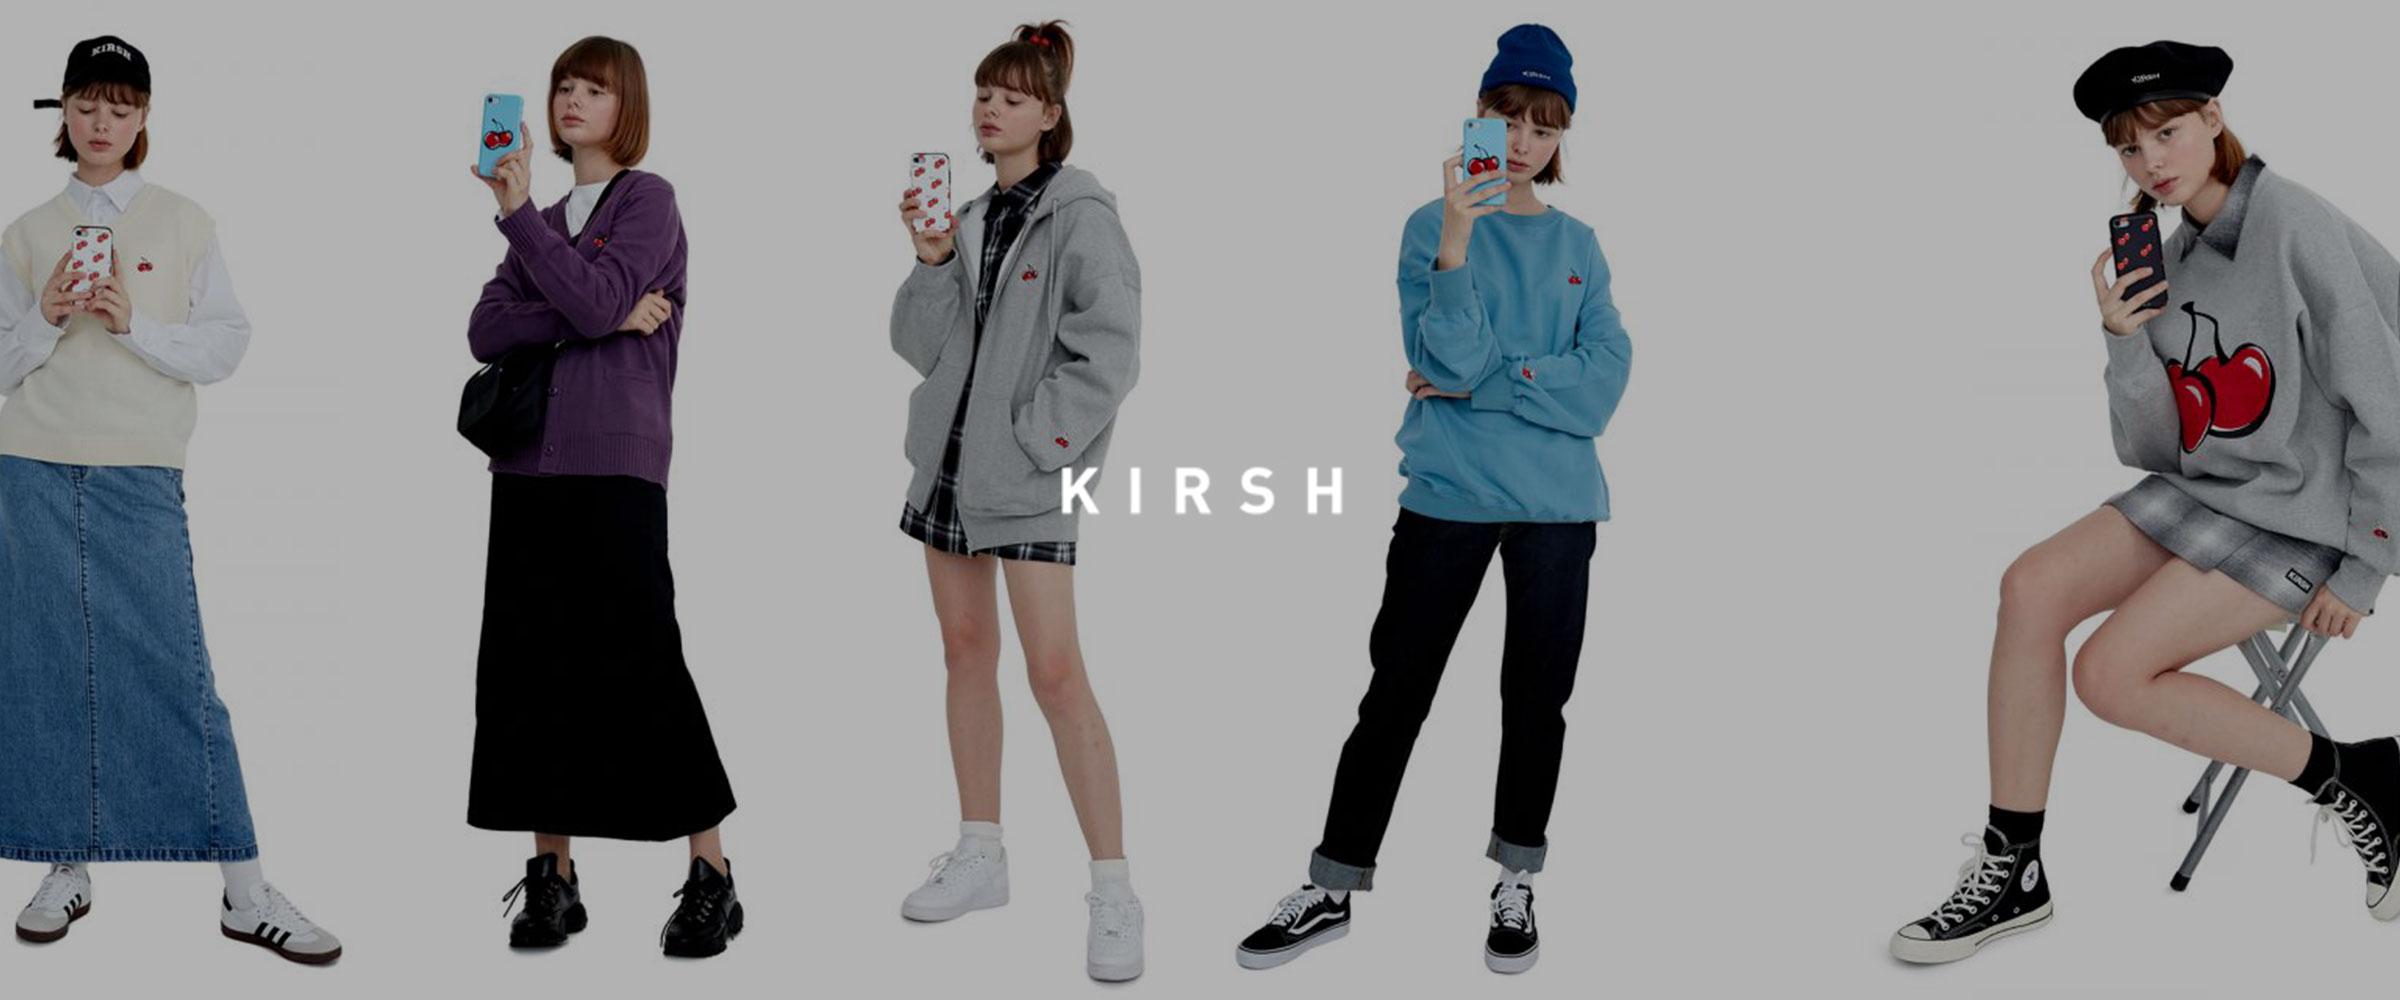 kirsh.jpg